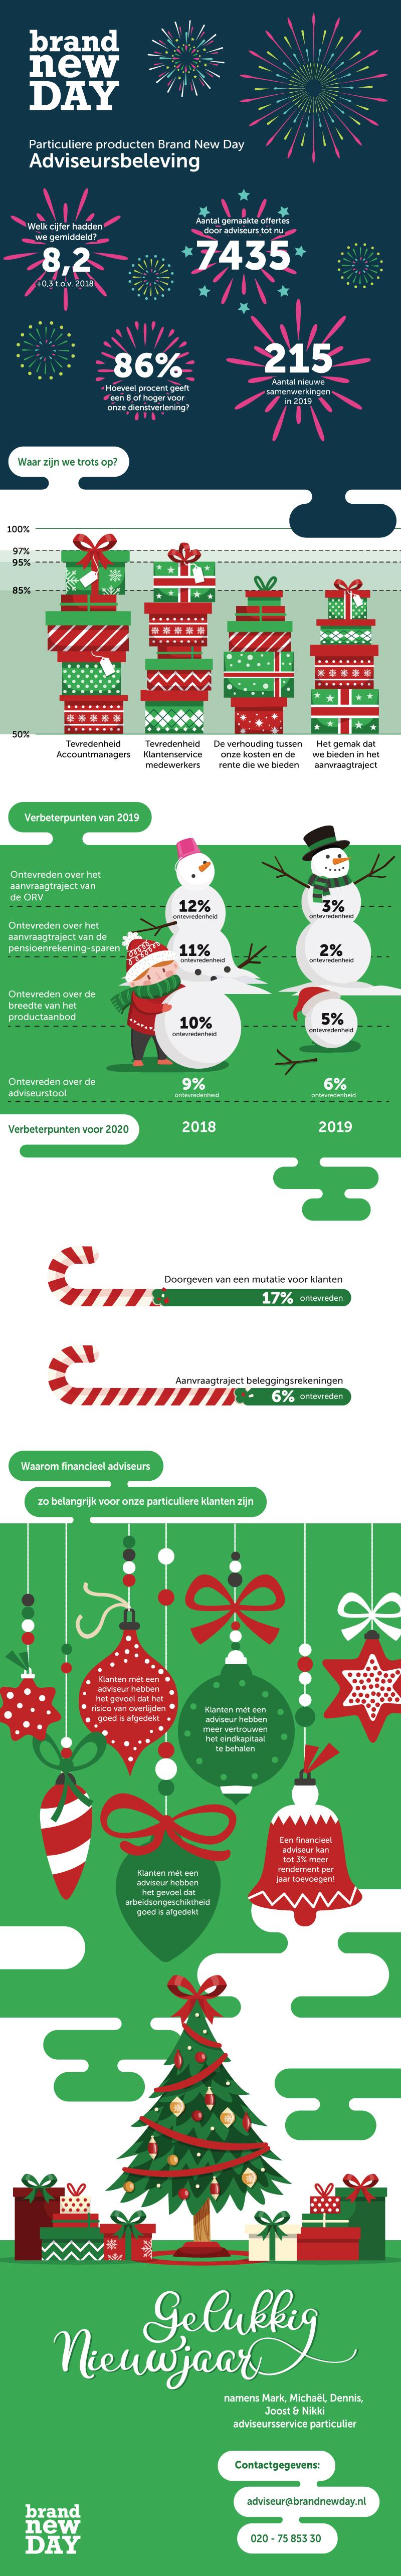 Particulier Adviseursbeleving 2018